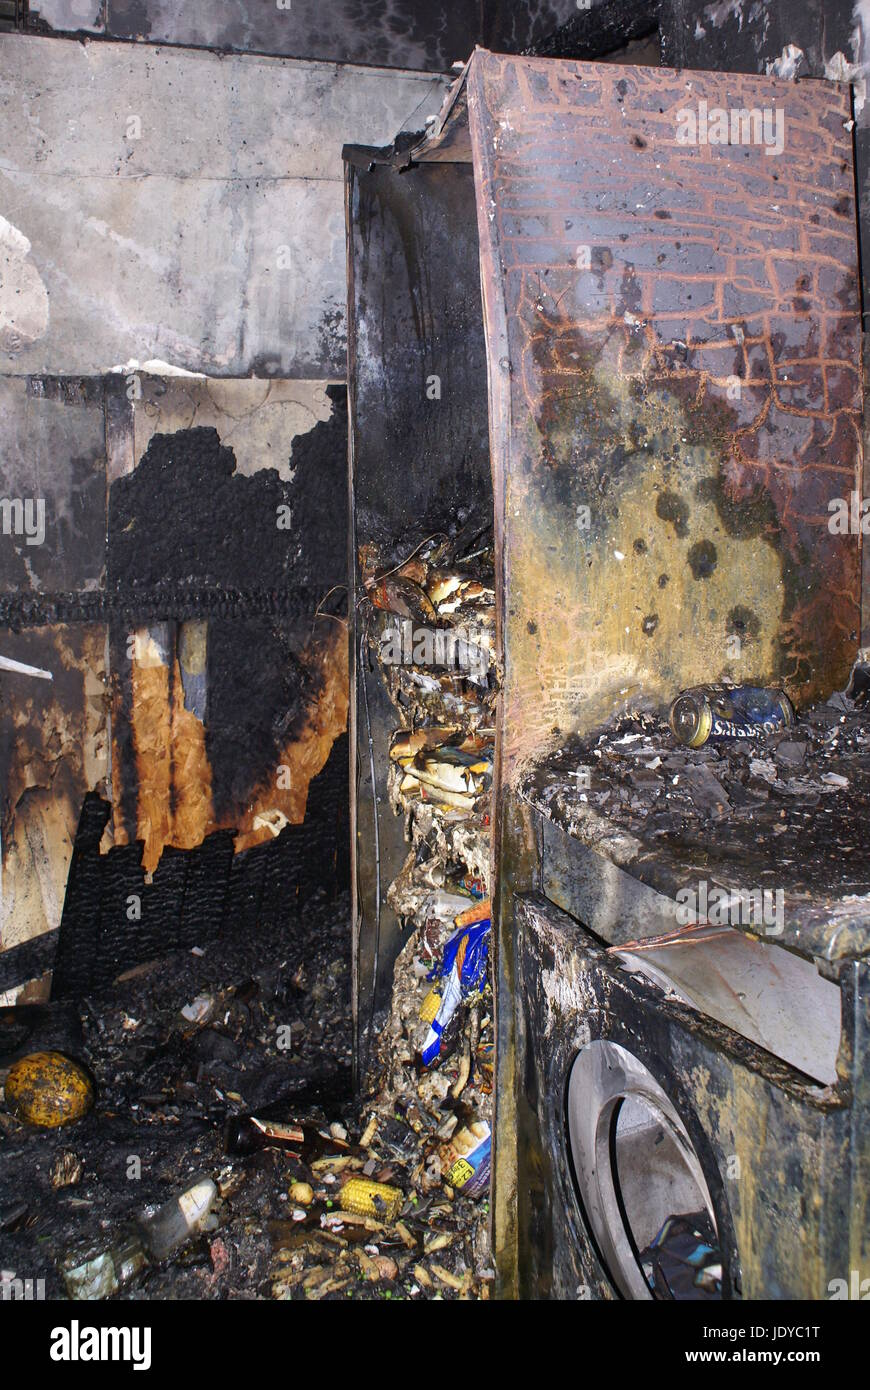 high rise flat fire, inferno, fridge fire, London - Stock Image